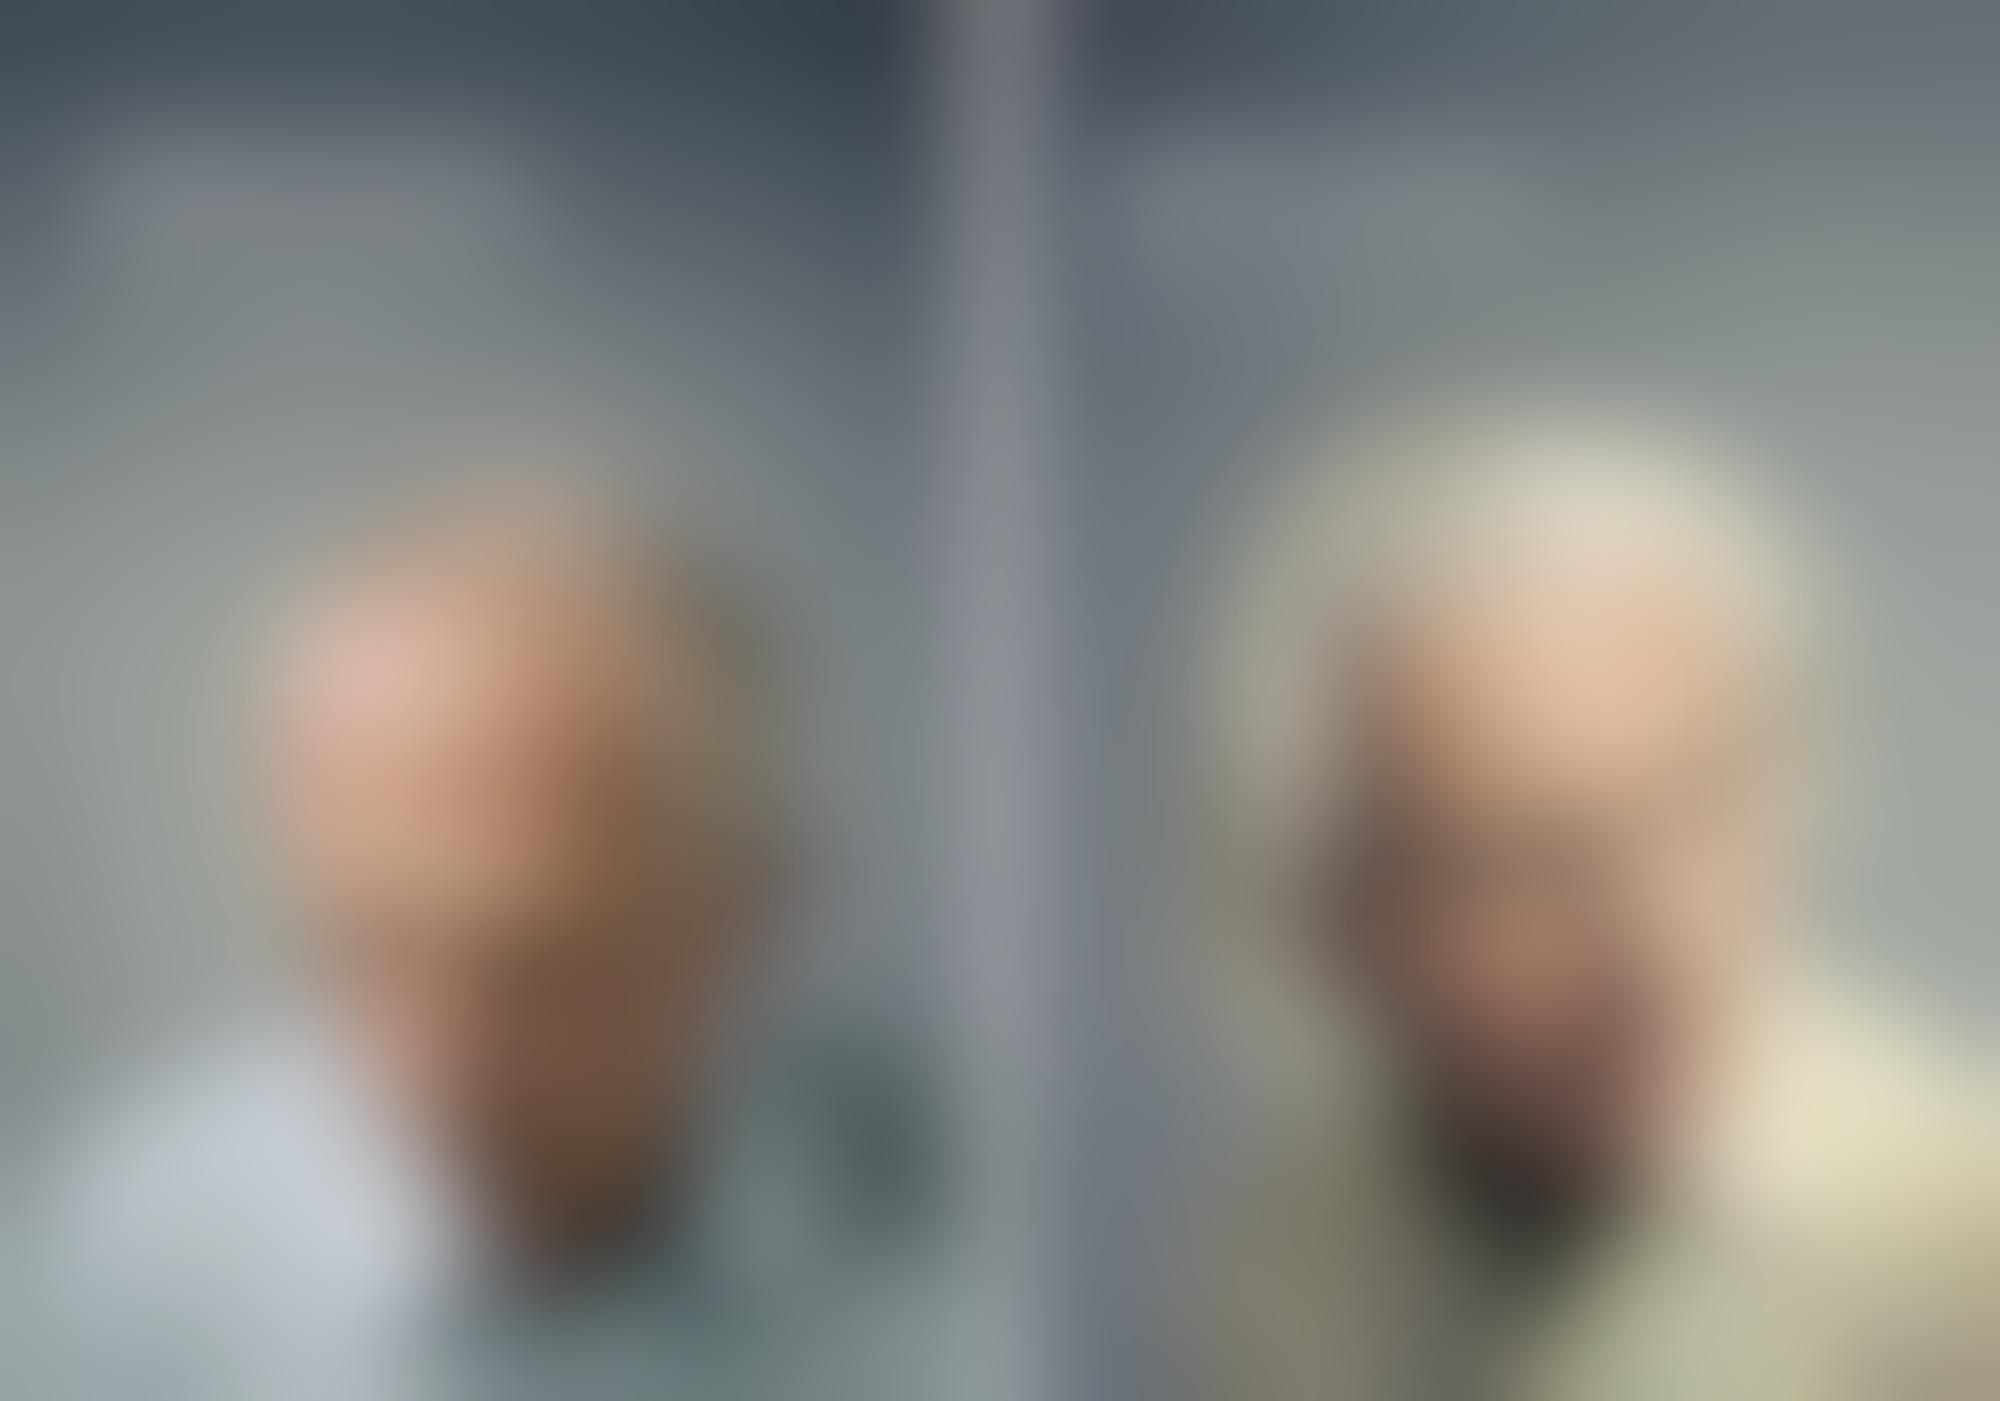 2012 british skin foundation posters Gary Salter autocompressfitresizeixlibphp 1 1 0max h2000max w3 D2000q80sffd532474d0e4cf2aaa1082d9ea9e439